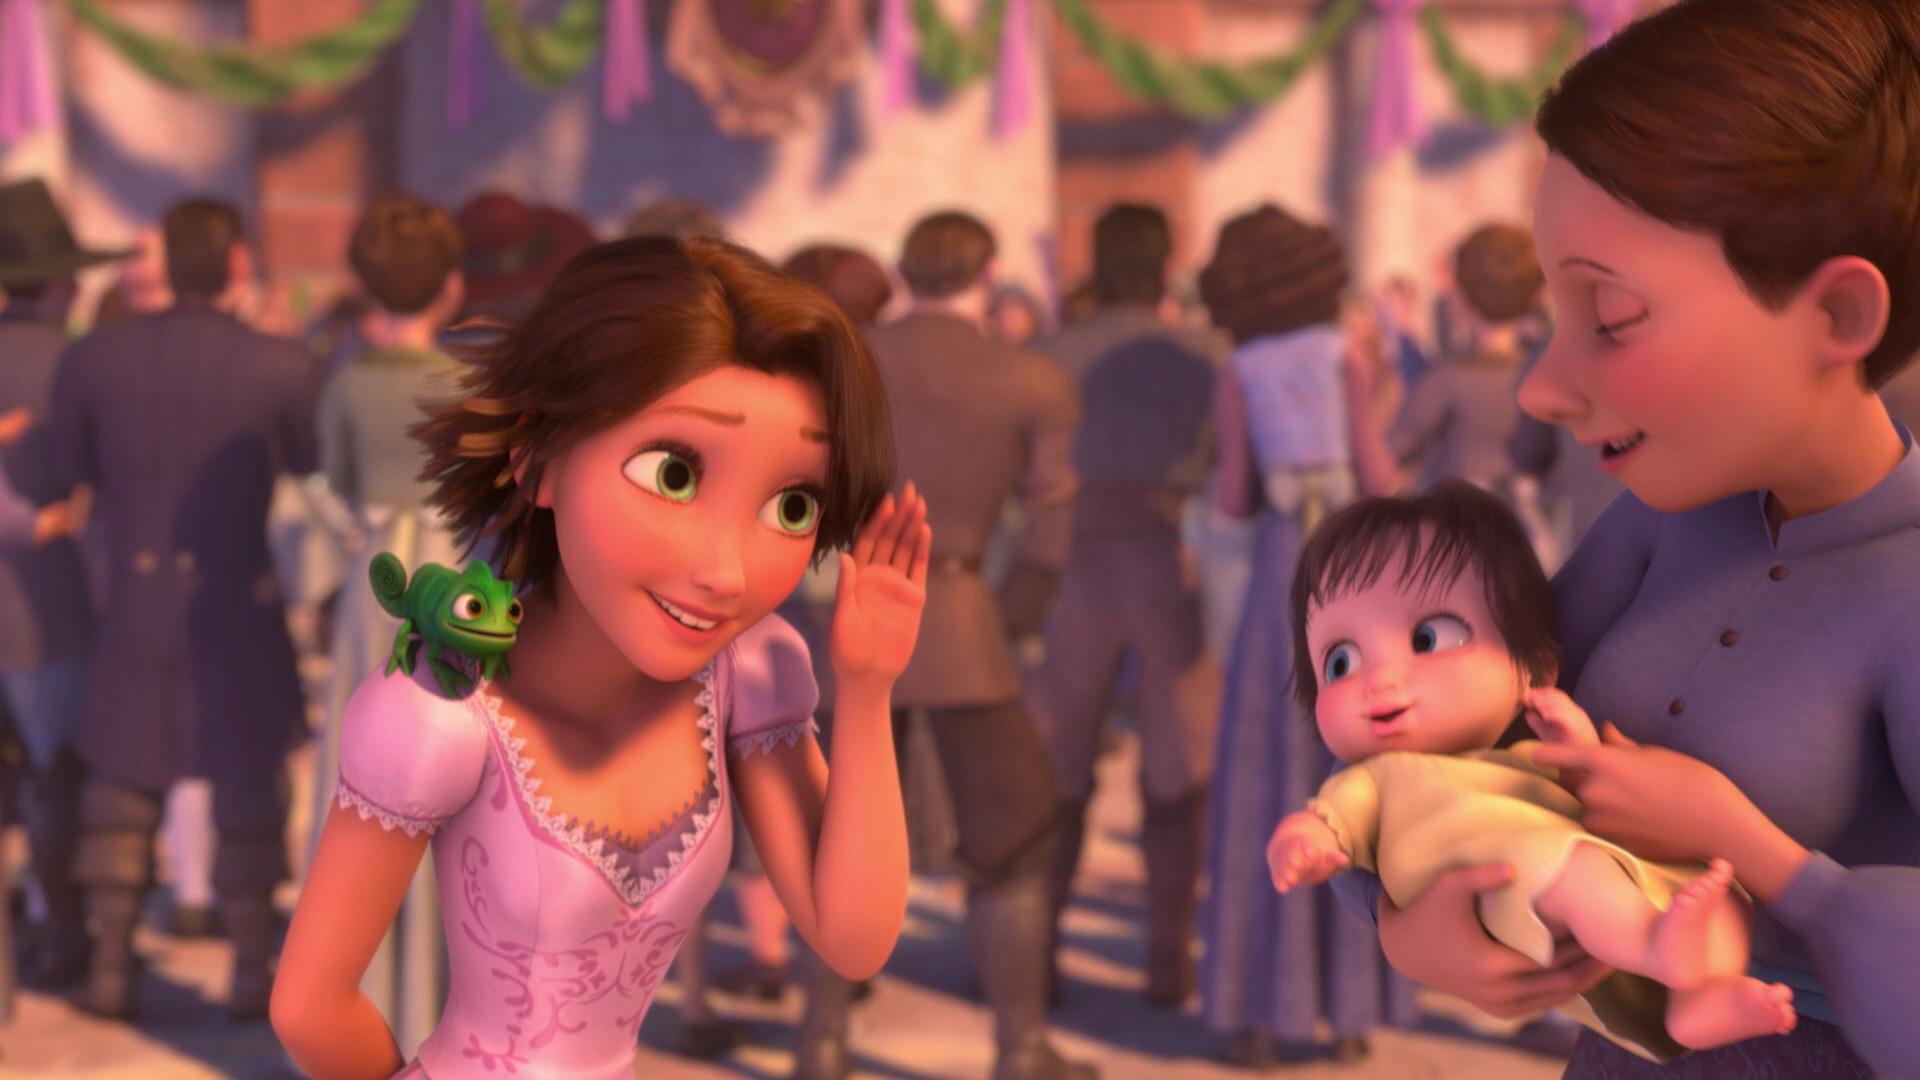 Princess Rapunzel Ending Rapunzel Of Disney S Tangled Foto 35423057 Fanpop